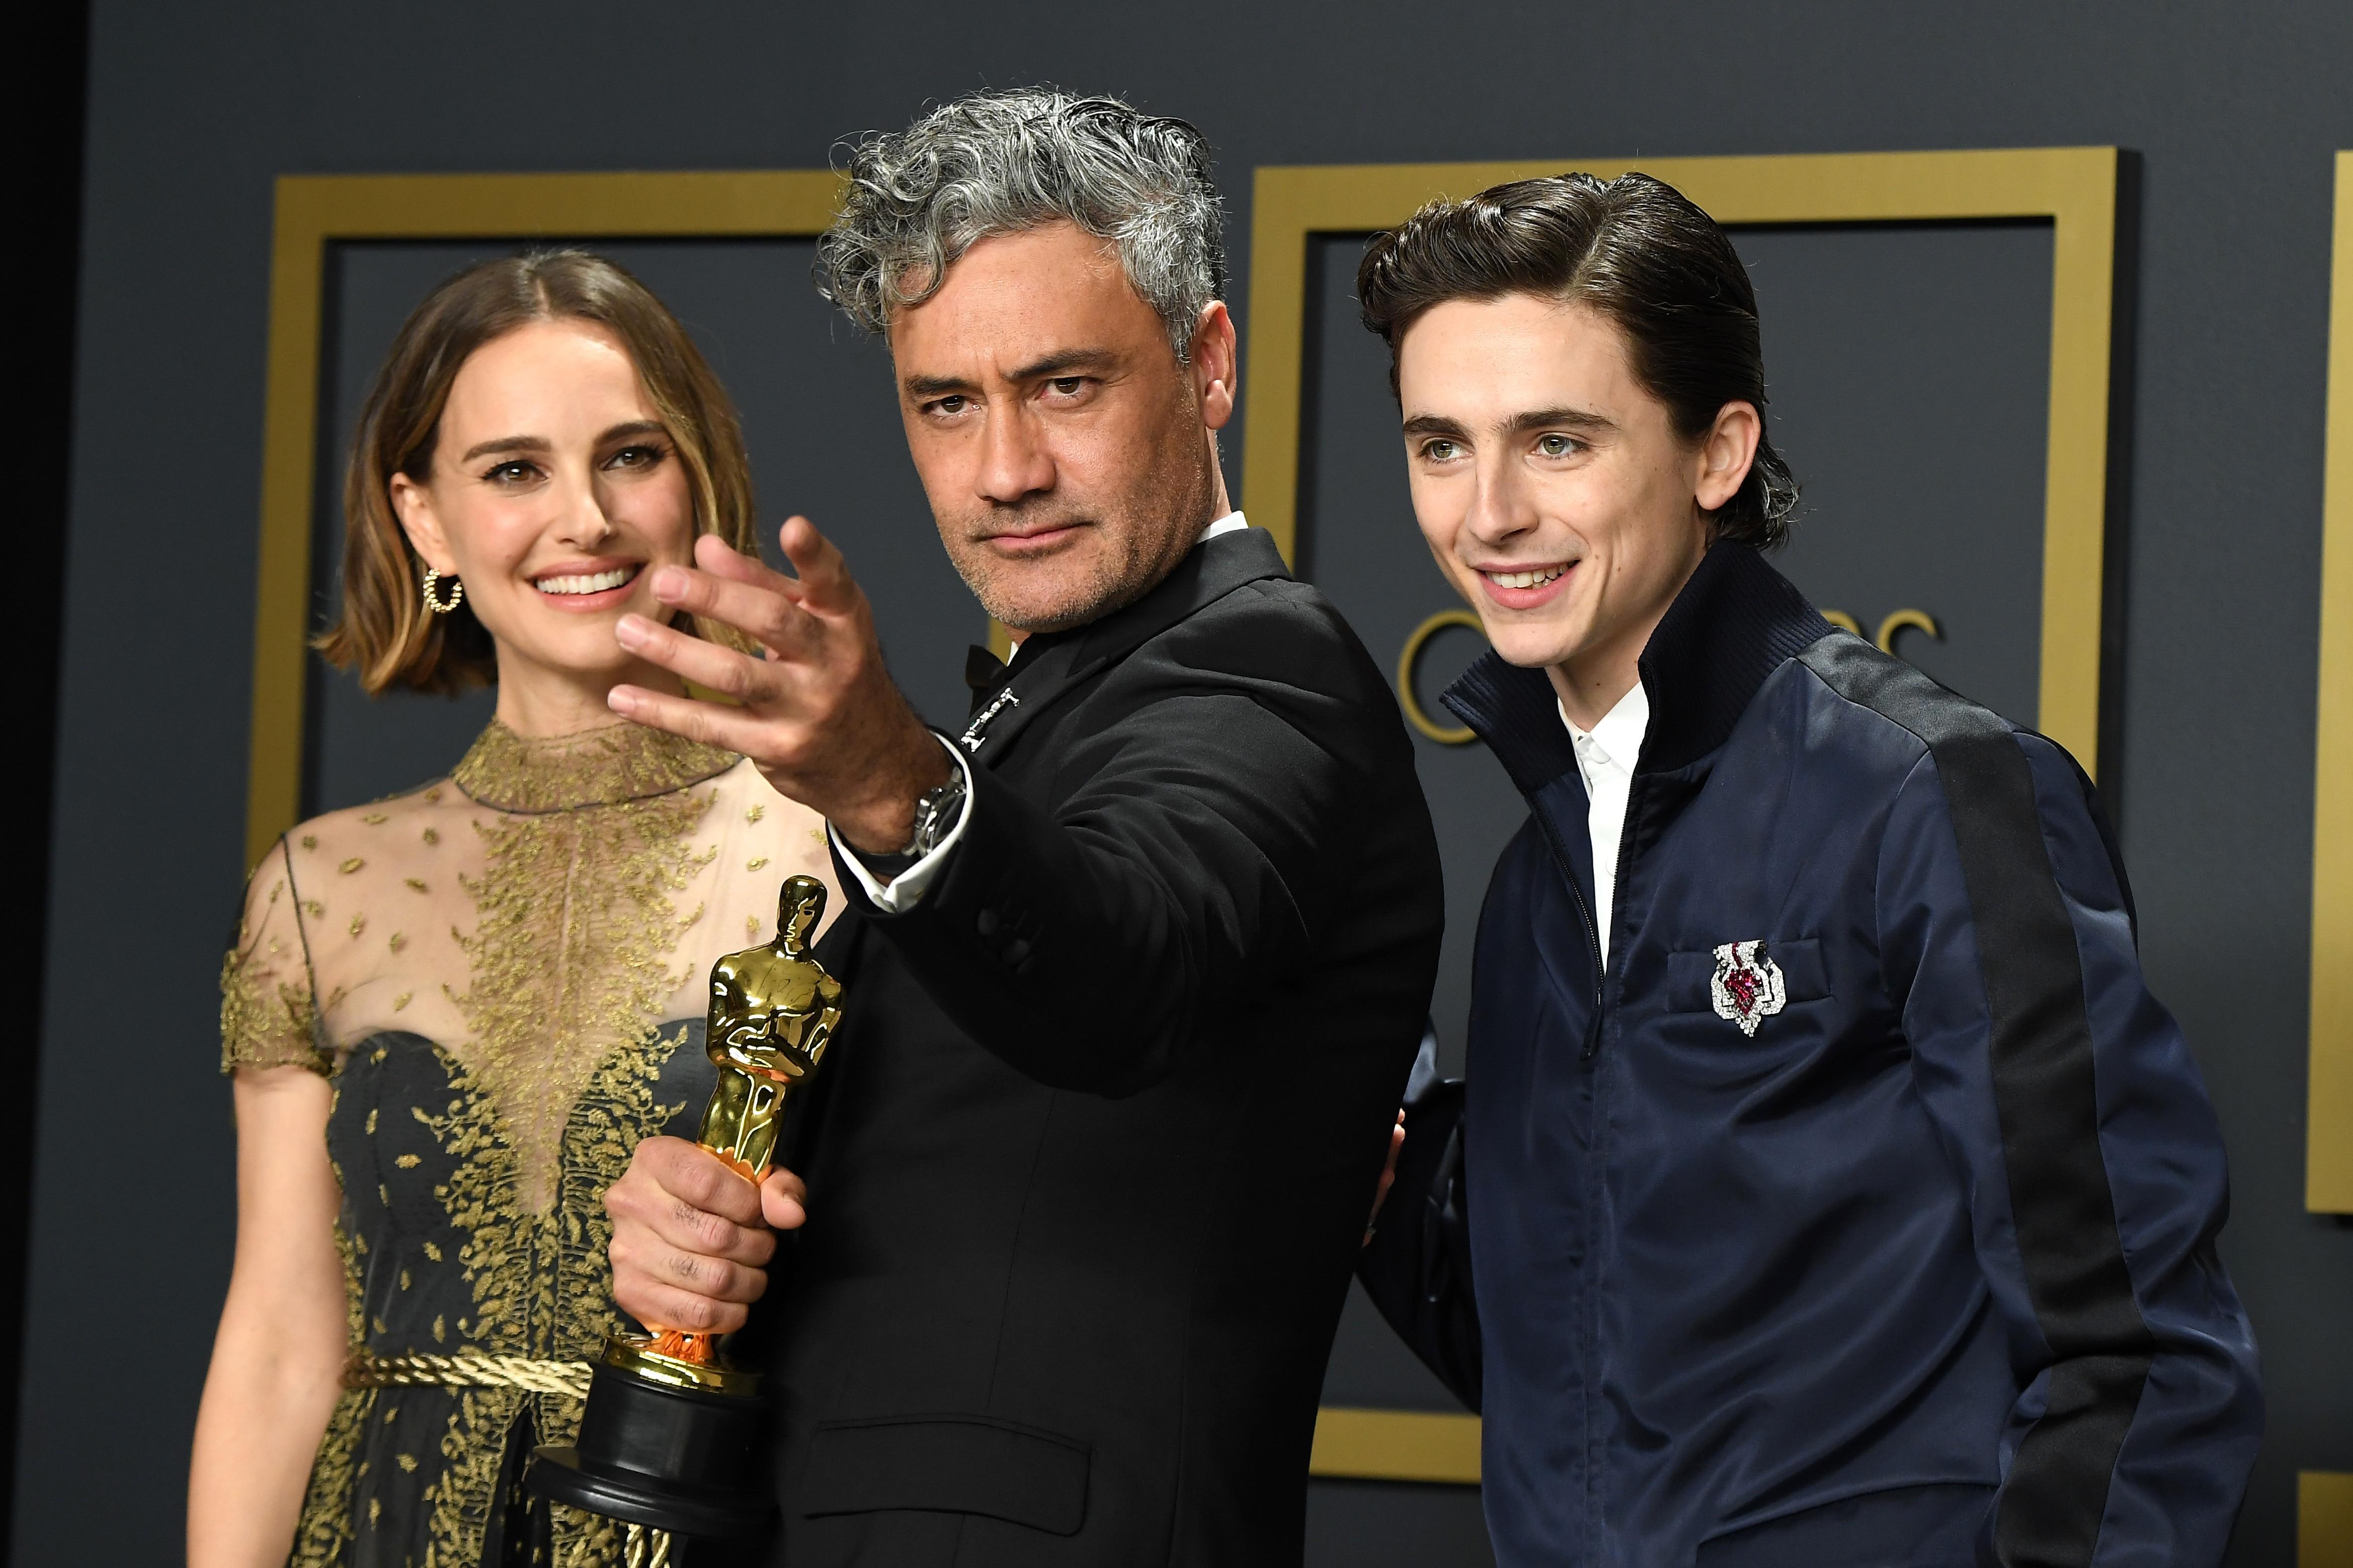 Natlie Portman, Taika Waititi, winner of the Adapted Screenplay award for Jojo Rabbit  and Timothee Chalamet pose in the press room.